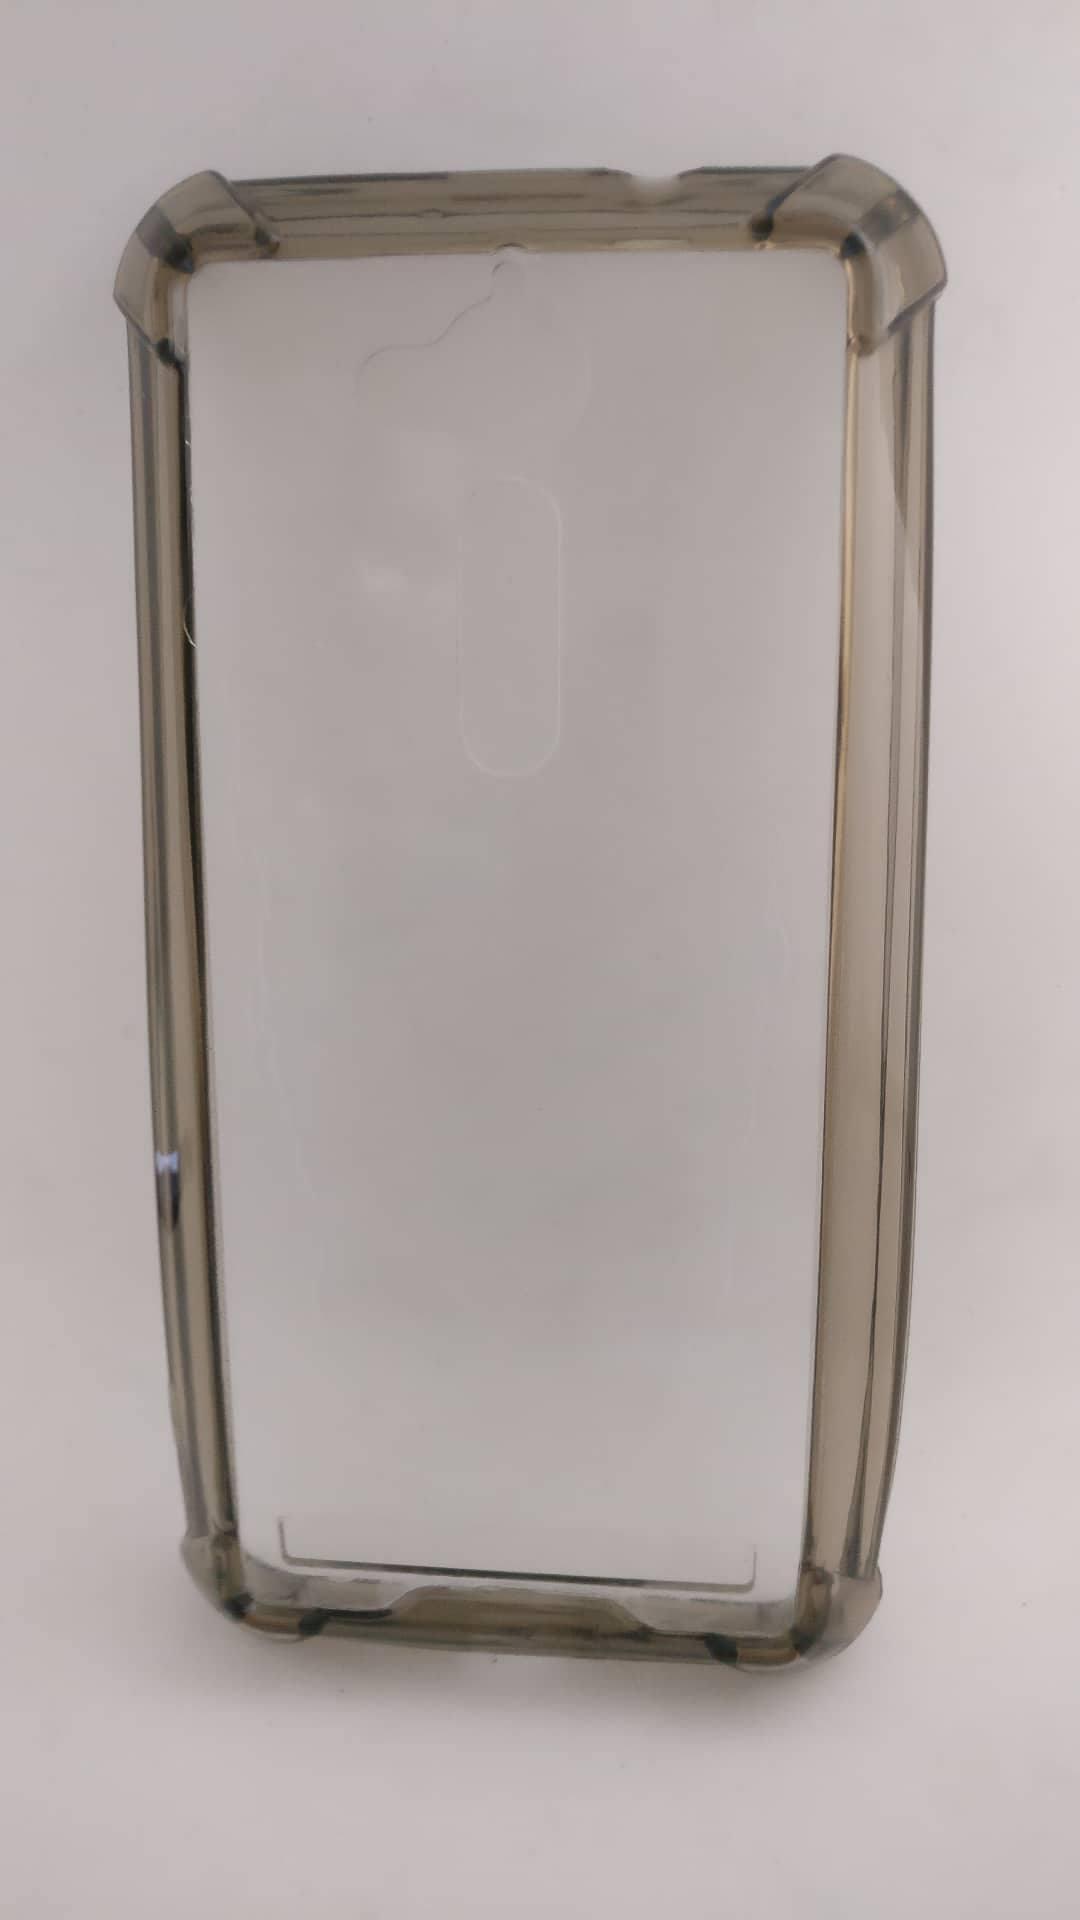 Buy Sell Cheapest Asus Fx503vd Best Quality Product Deals Frame Keybord Laptop X 455 Casing Shock Proof Case For Zenfone Go Lite Zb500kl Zb500kg